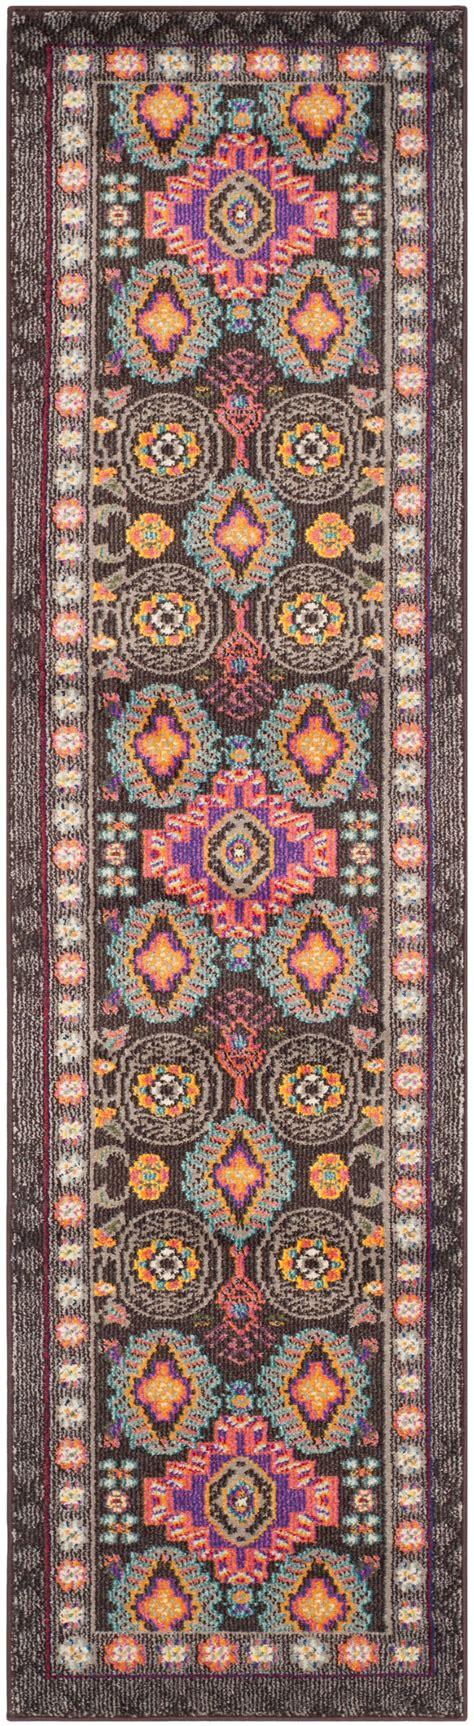 safavieh rug runners brown multi safavieh monaco polyproplene runner rug 2 2